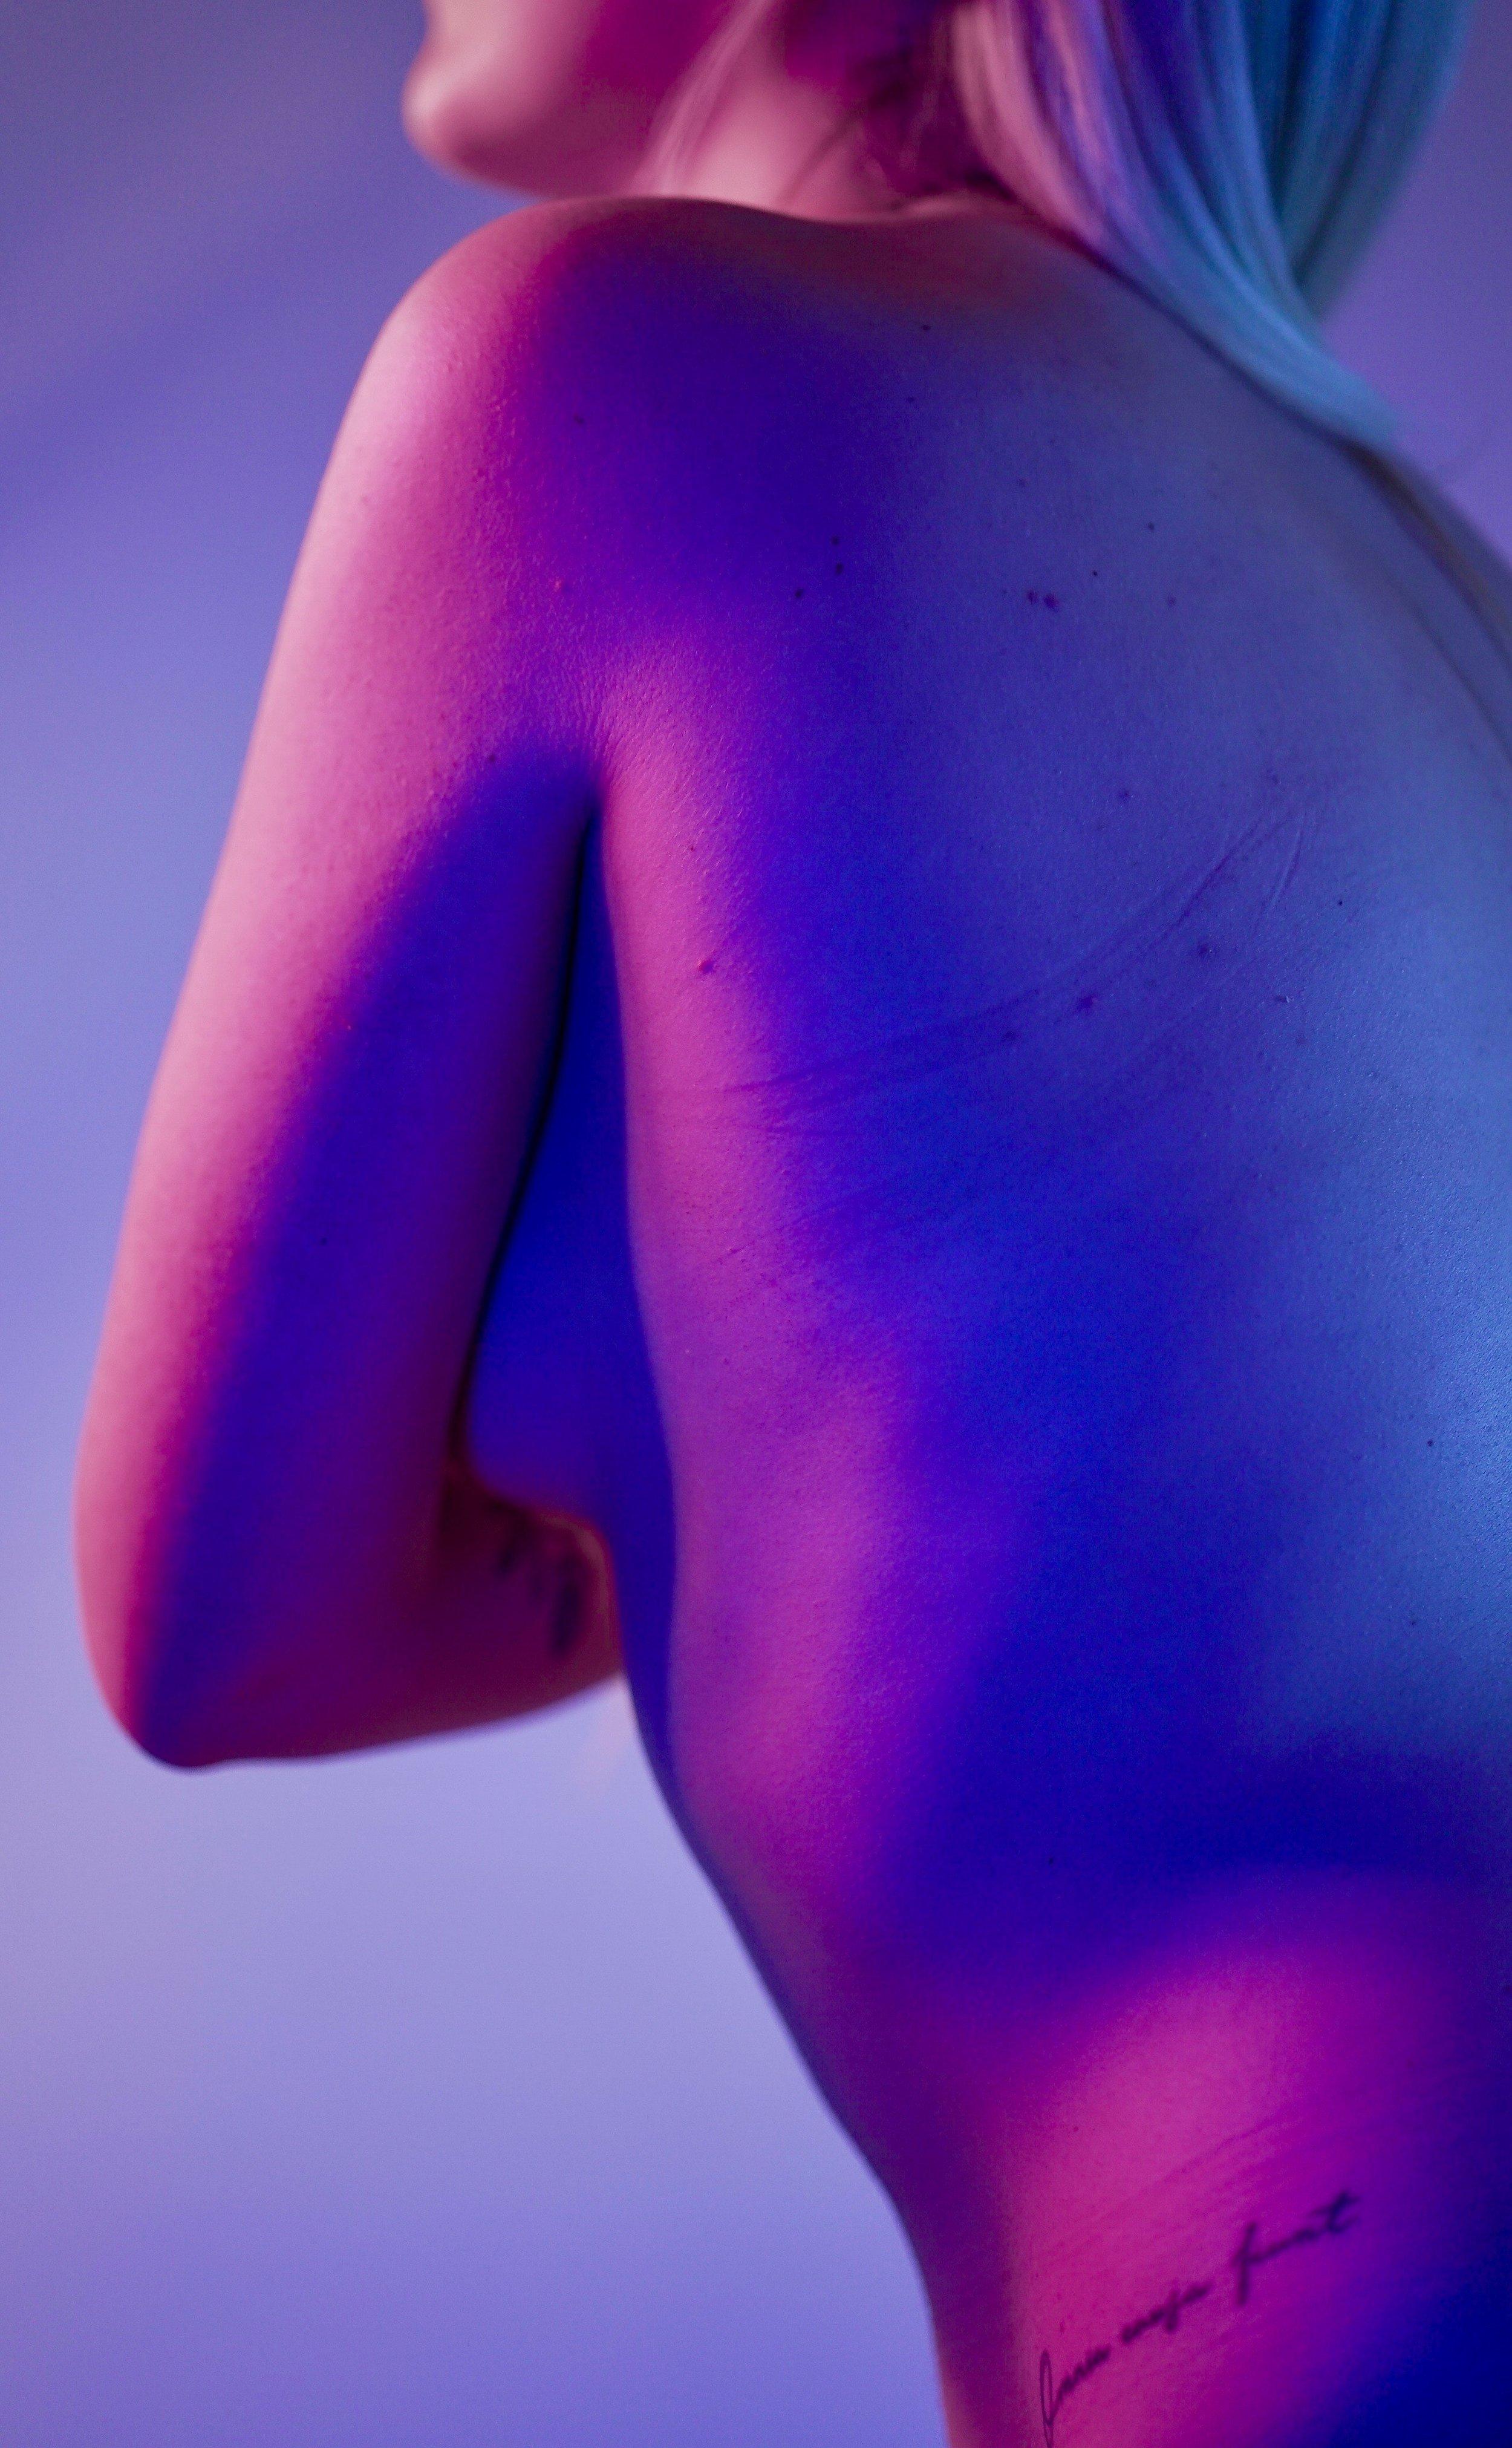 adult-alluring-body-1816943.jpg